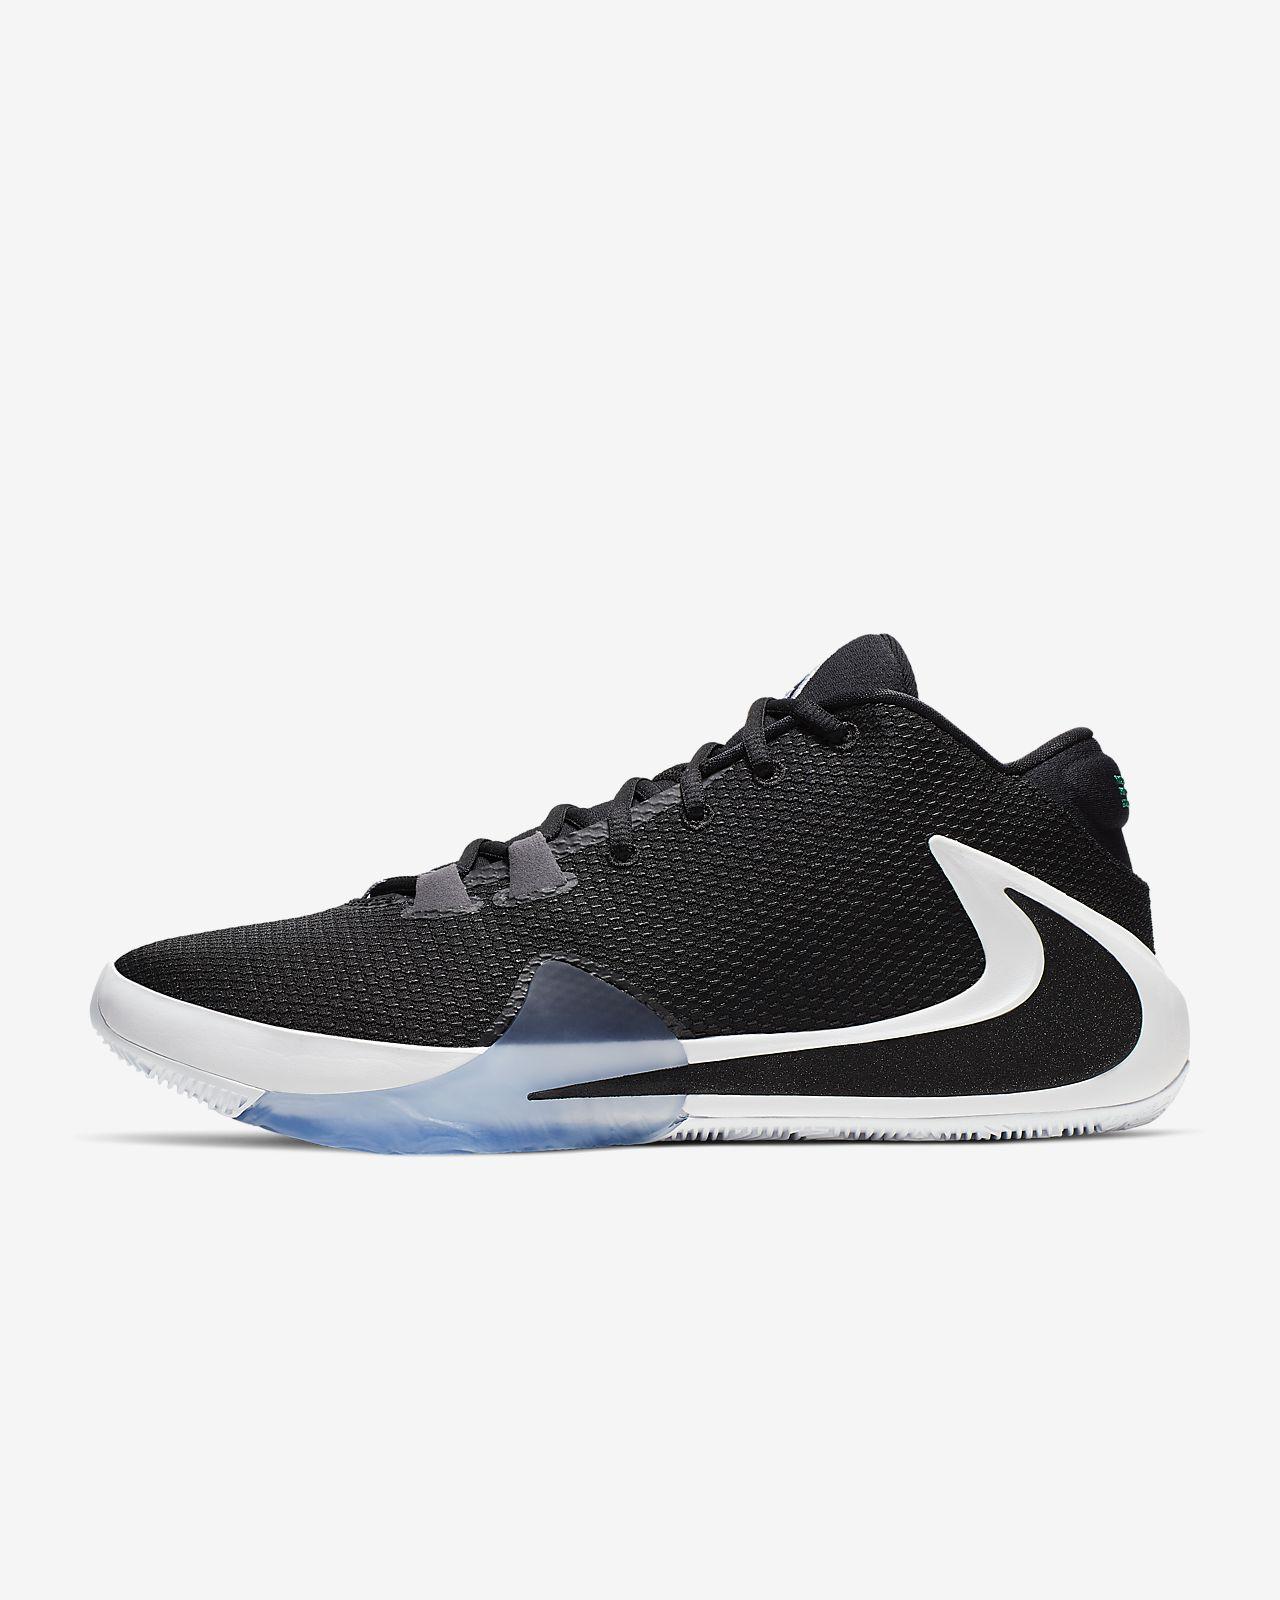 Chaussure de basketball Zoom Freak 1